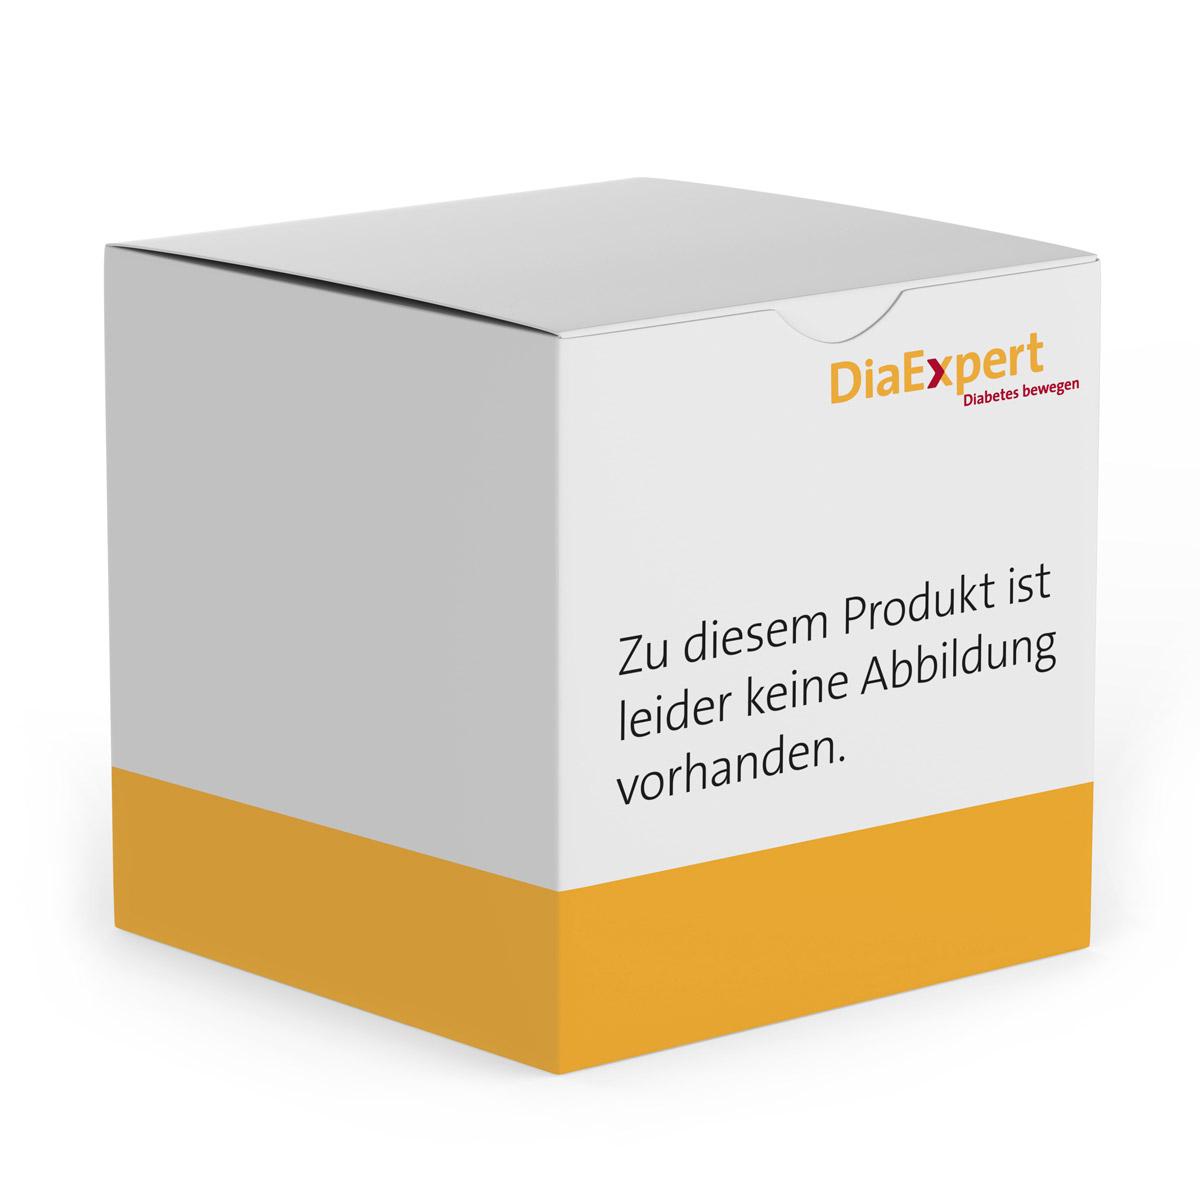 GlucoMen LX ß-Ketone Sensor Teststreifen 10 Stück (2x5 St.)